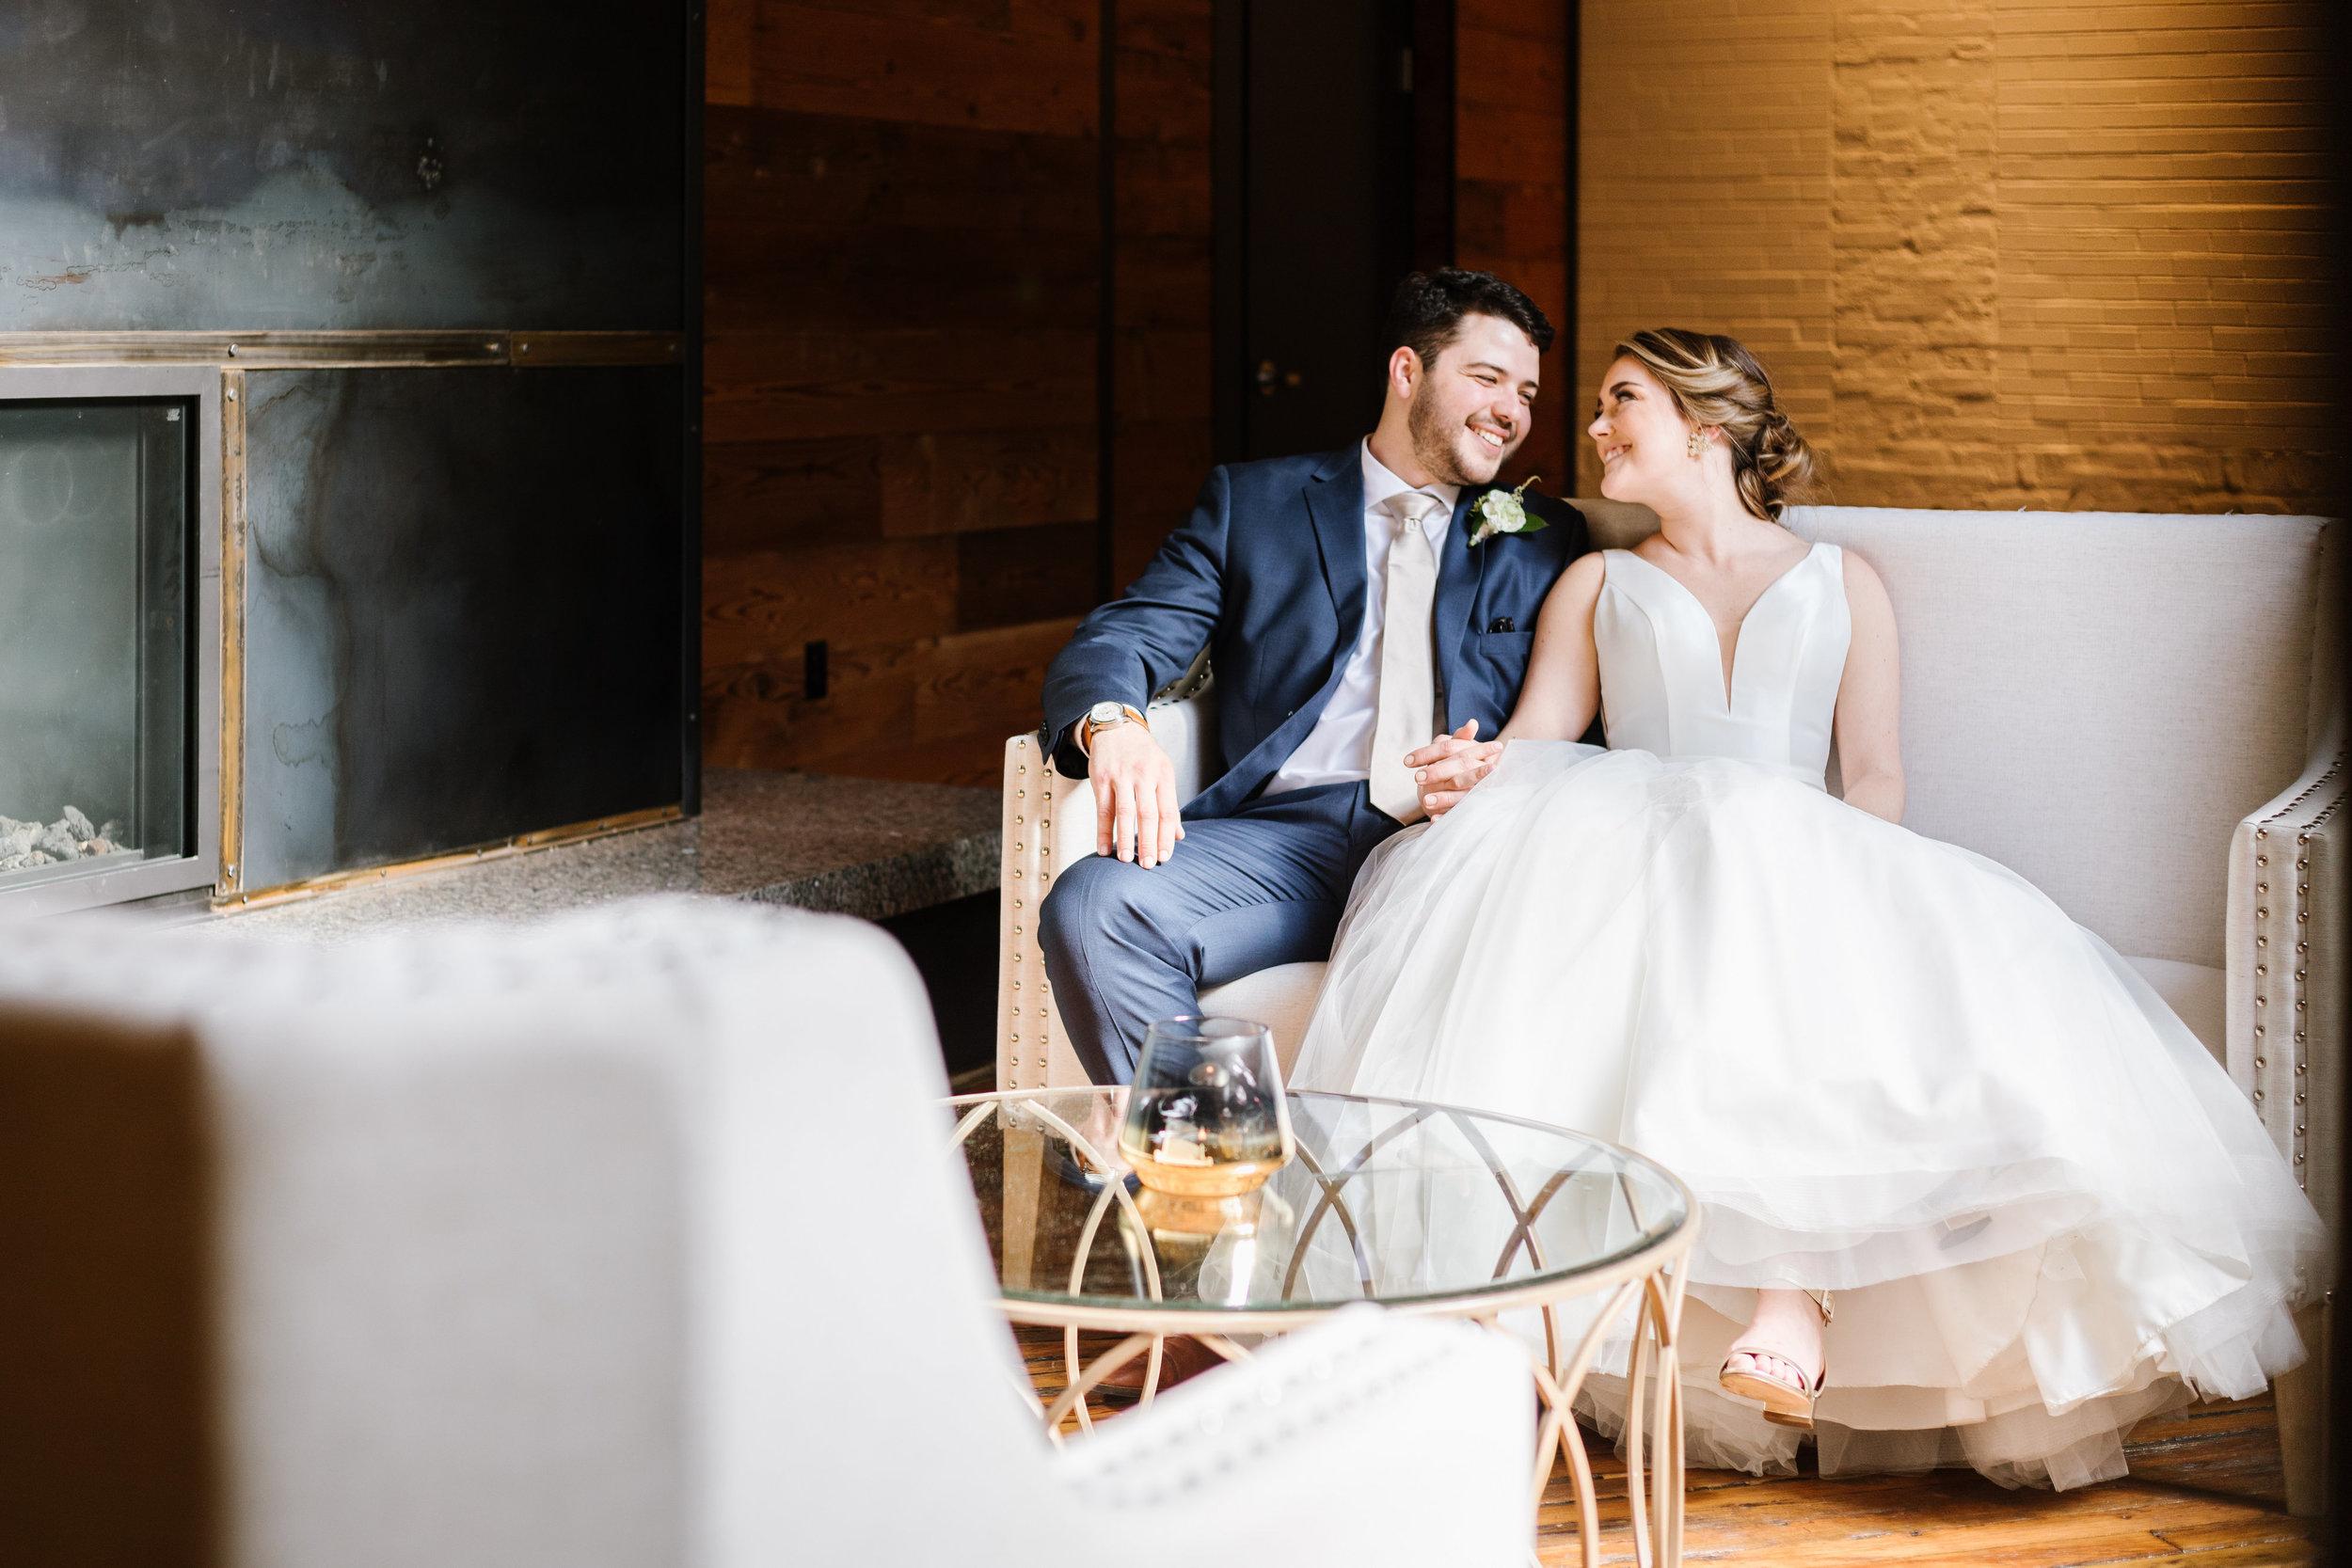 accelerator-space-wedding-ceremony-den-space.jpg